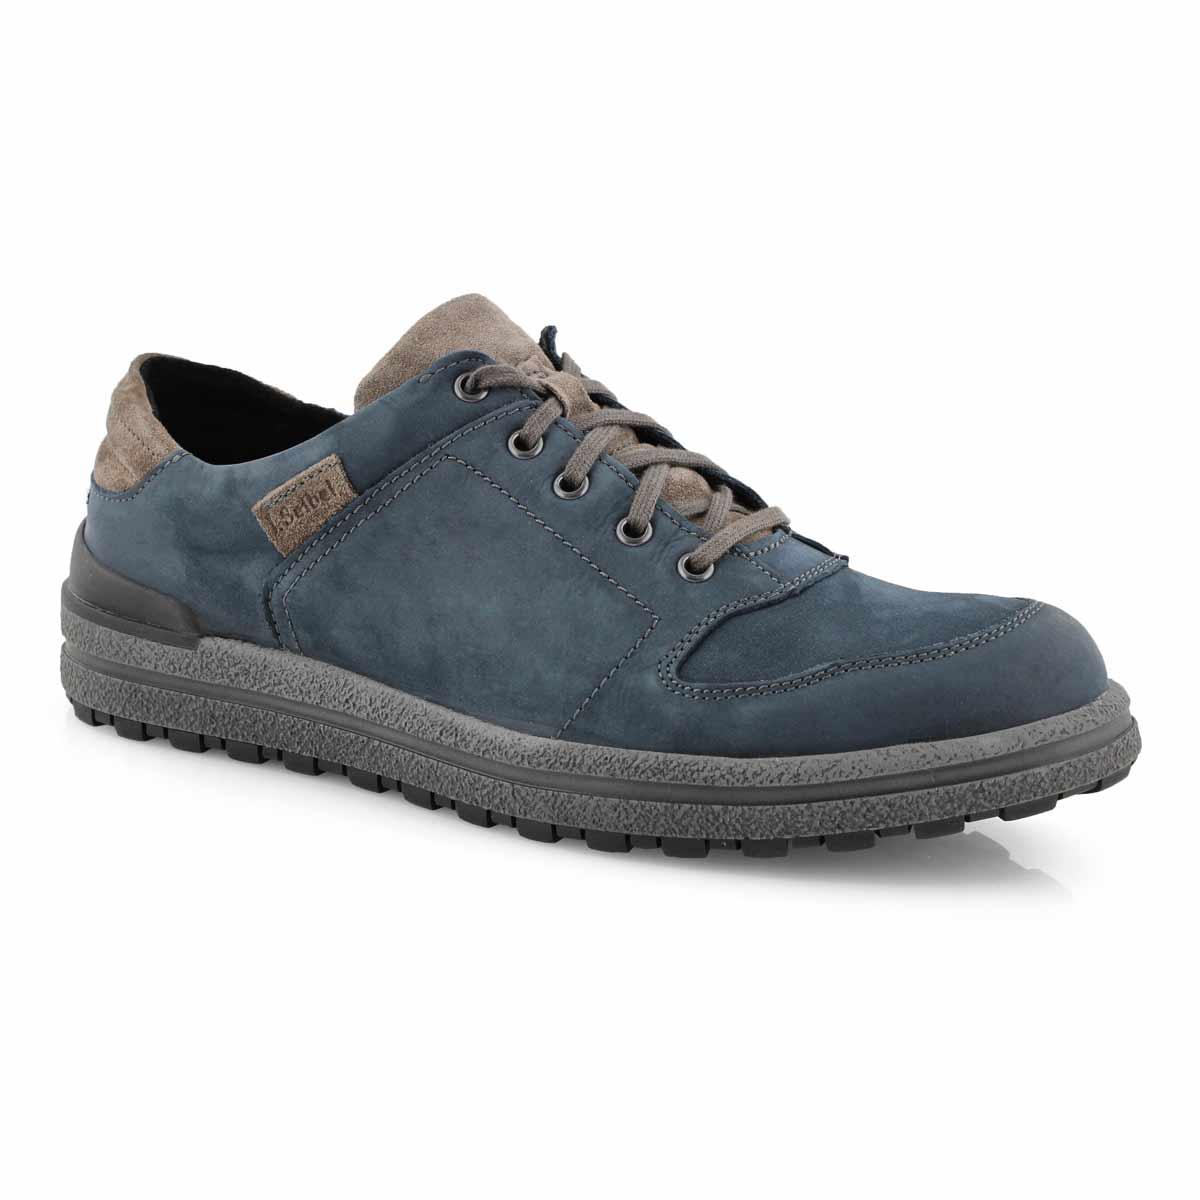 Mns Emil 17 ocean lace up sneaker